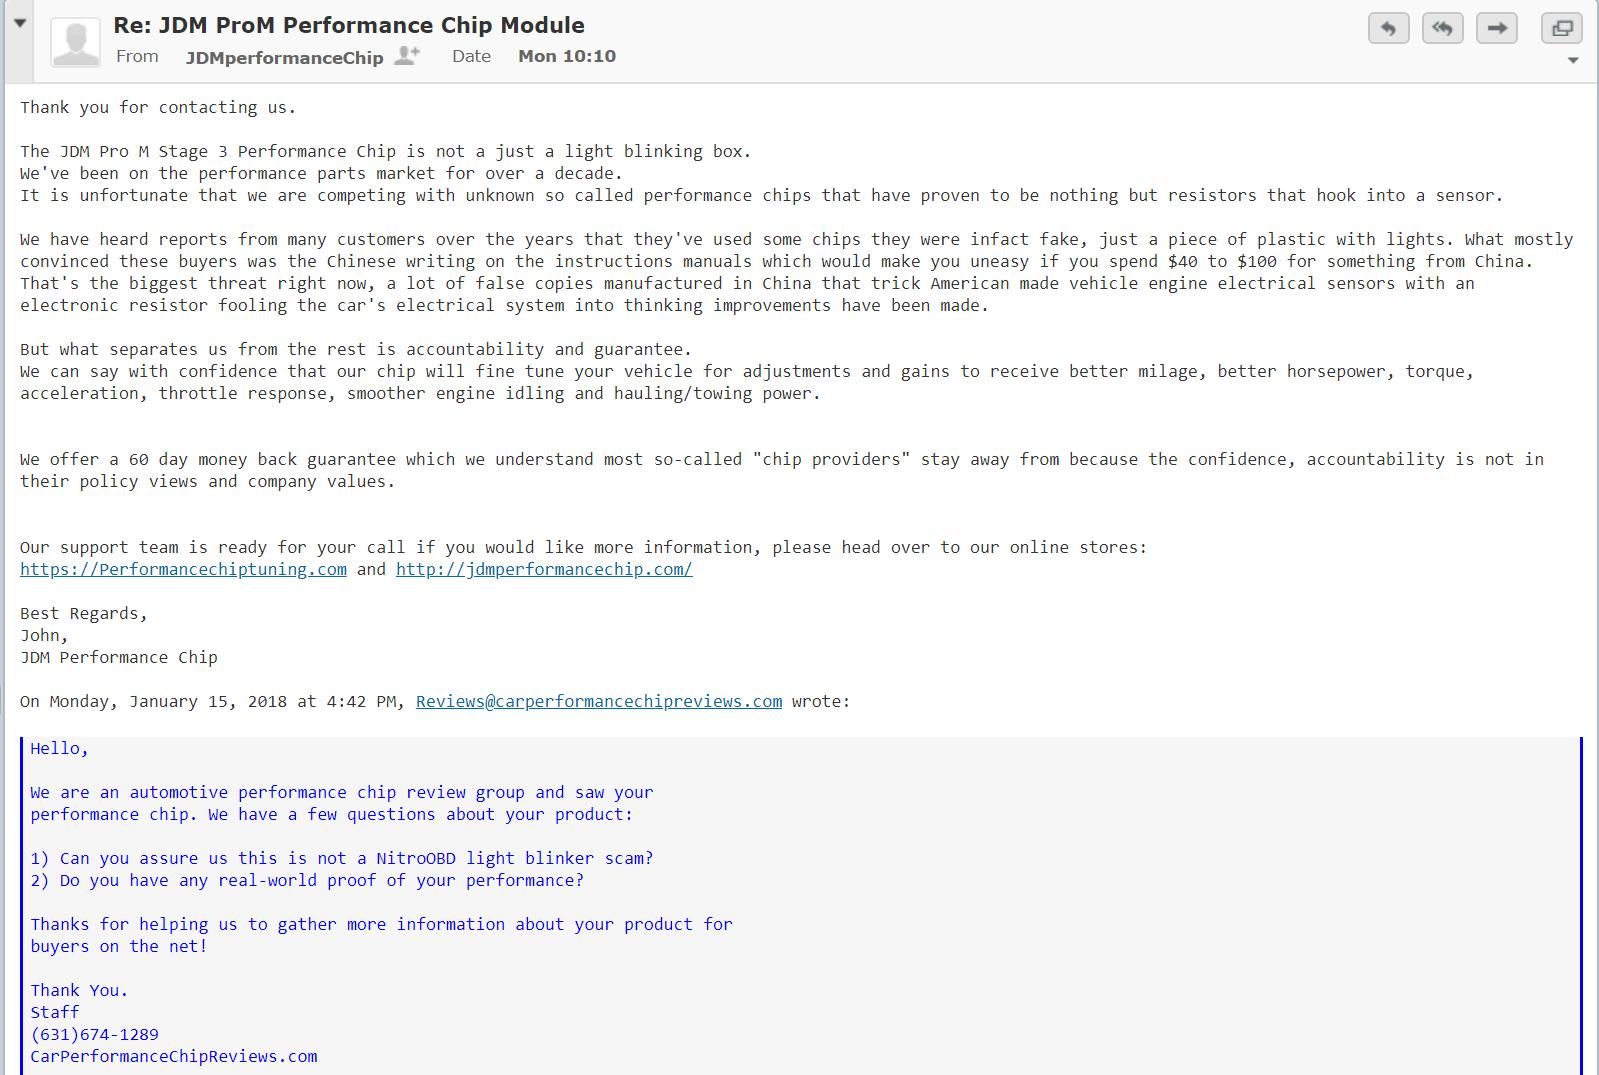 JDM ProM email response